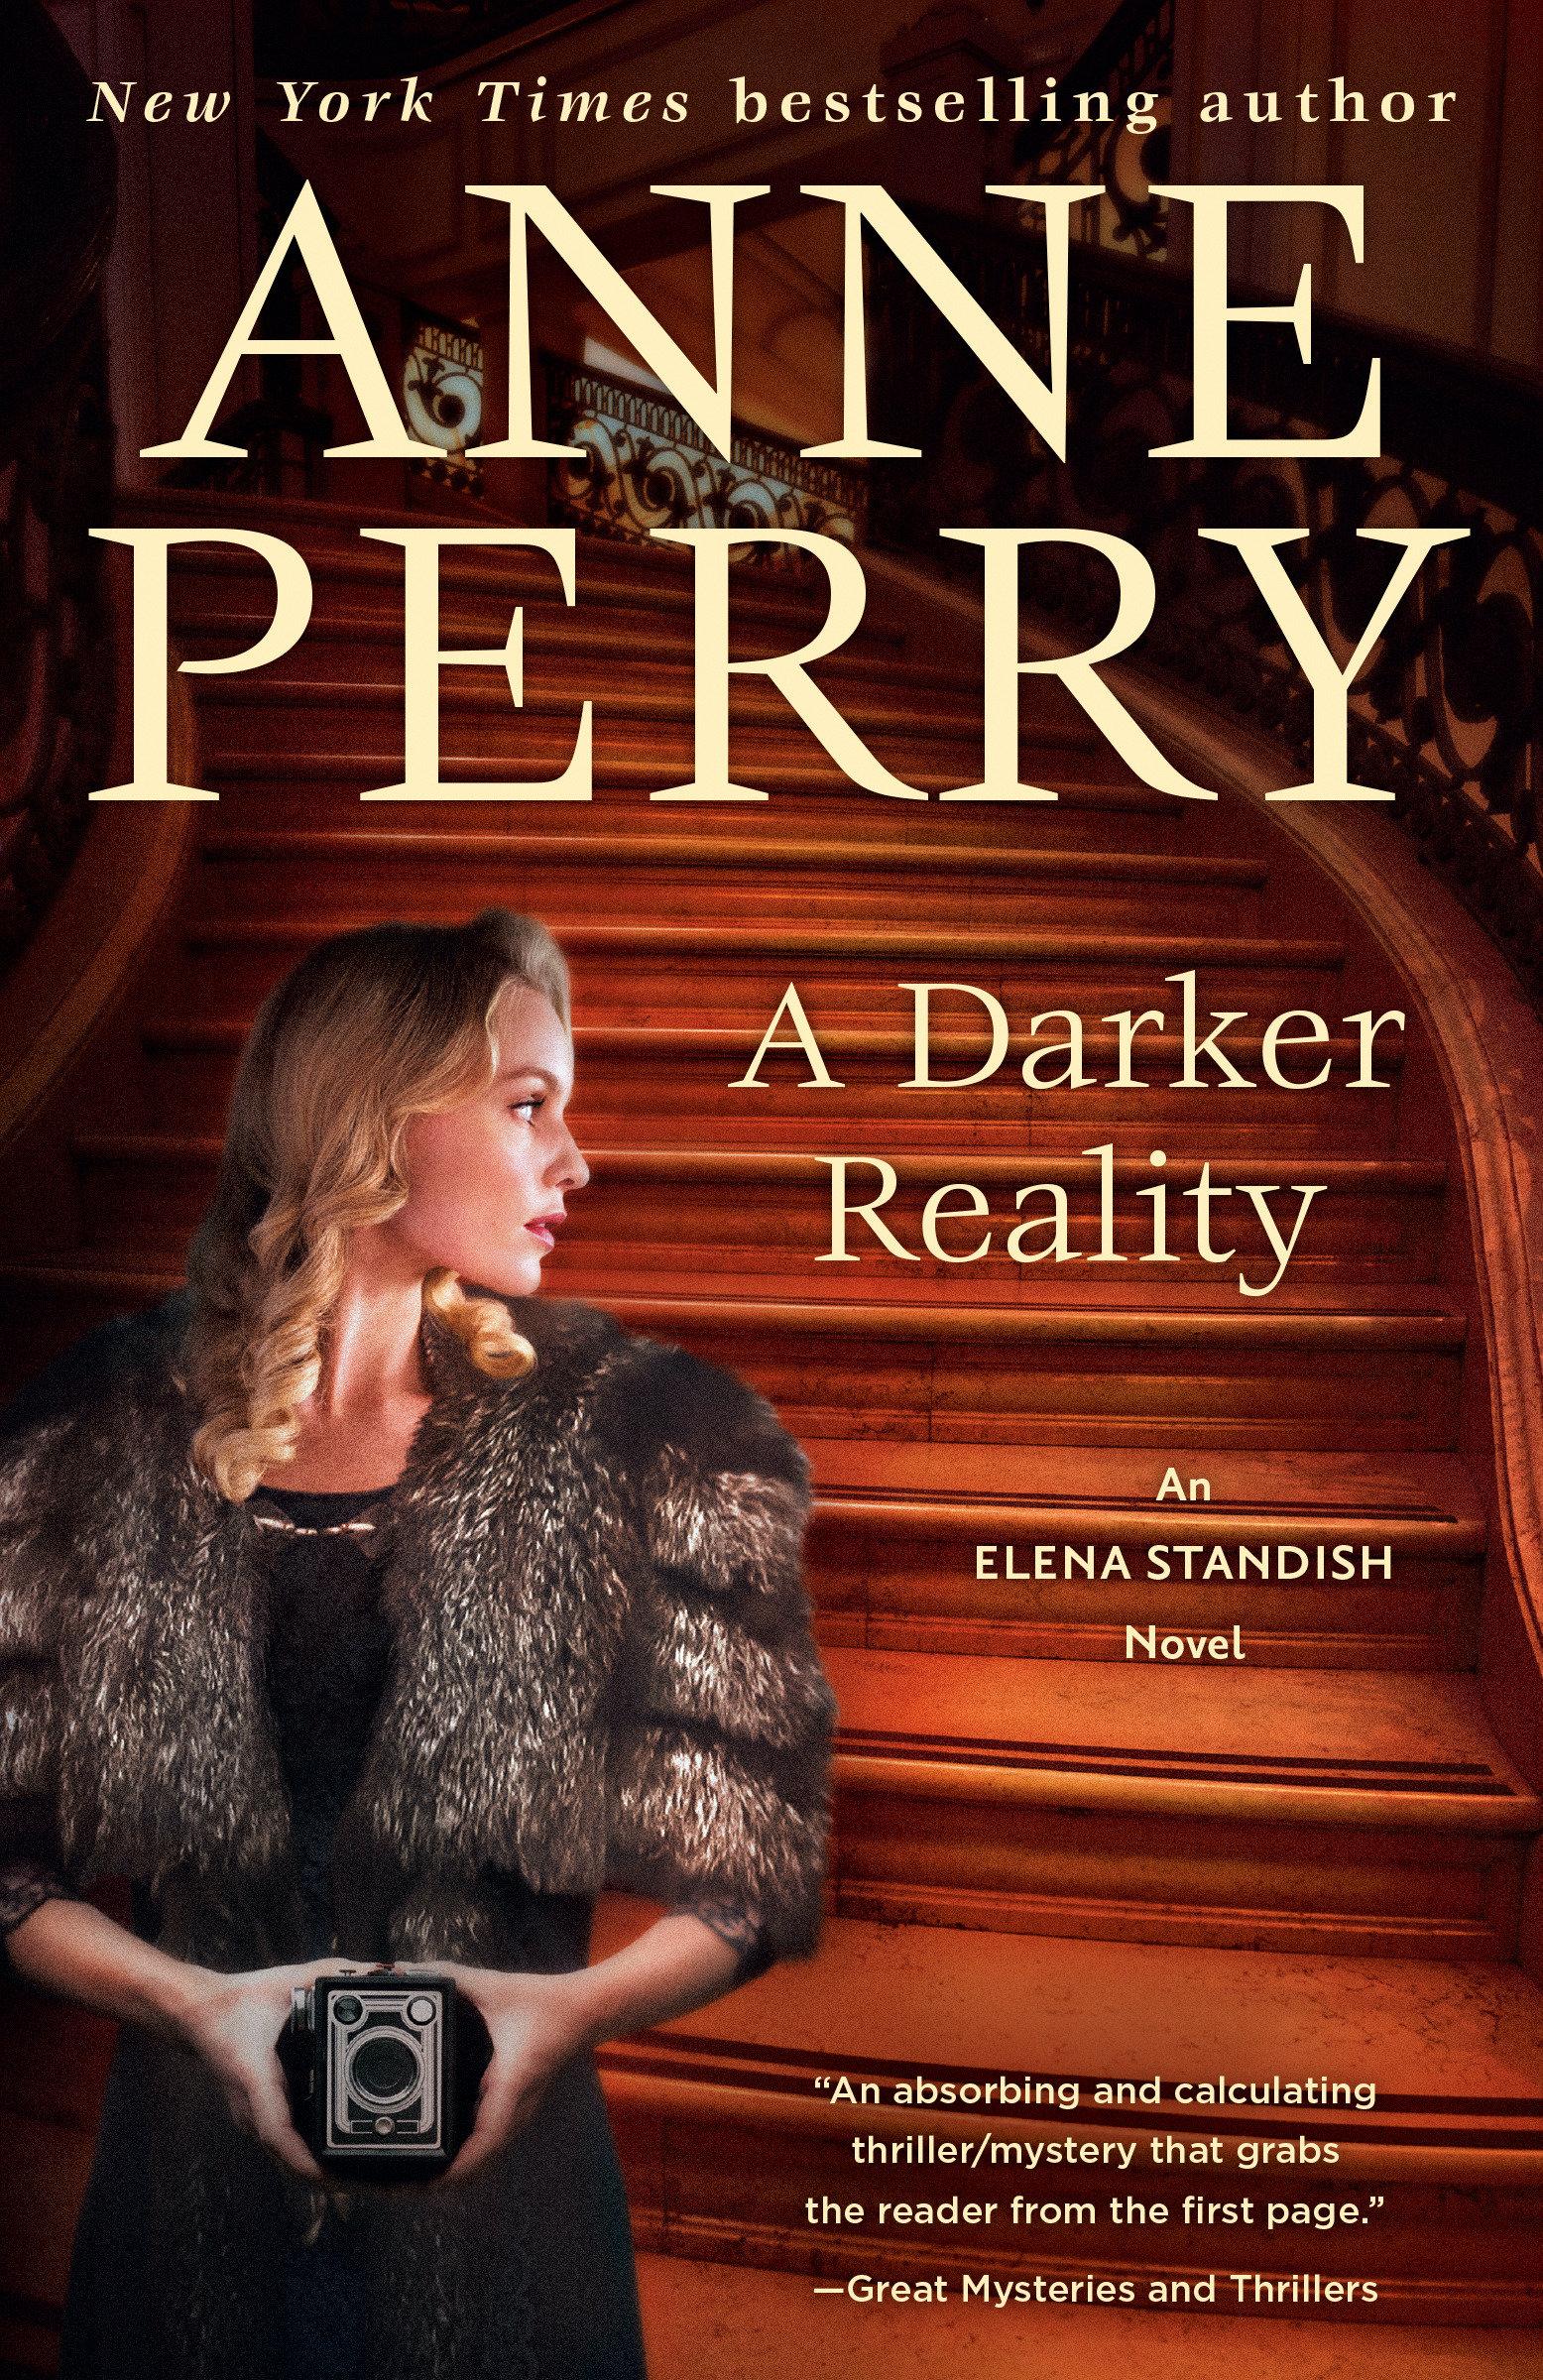 A Darker Reality An Elena Standish Novel